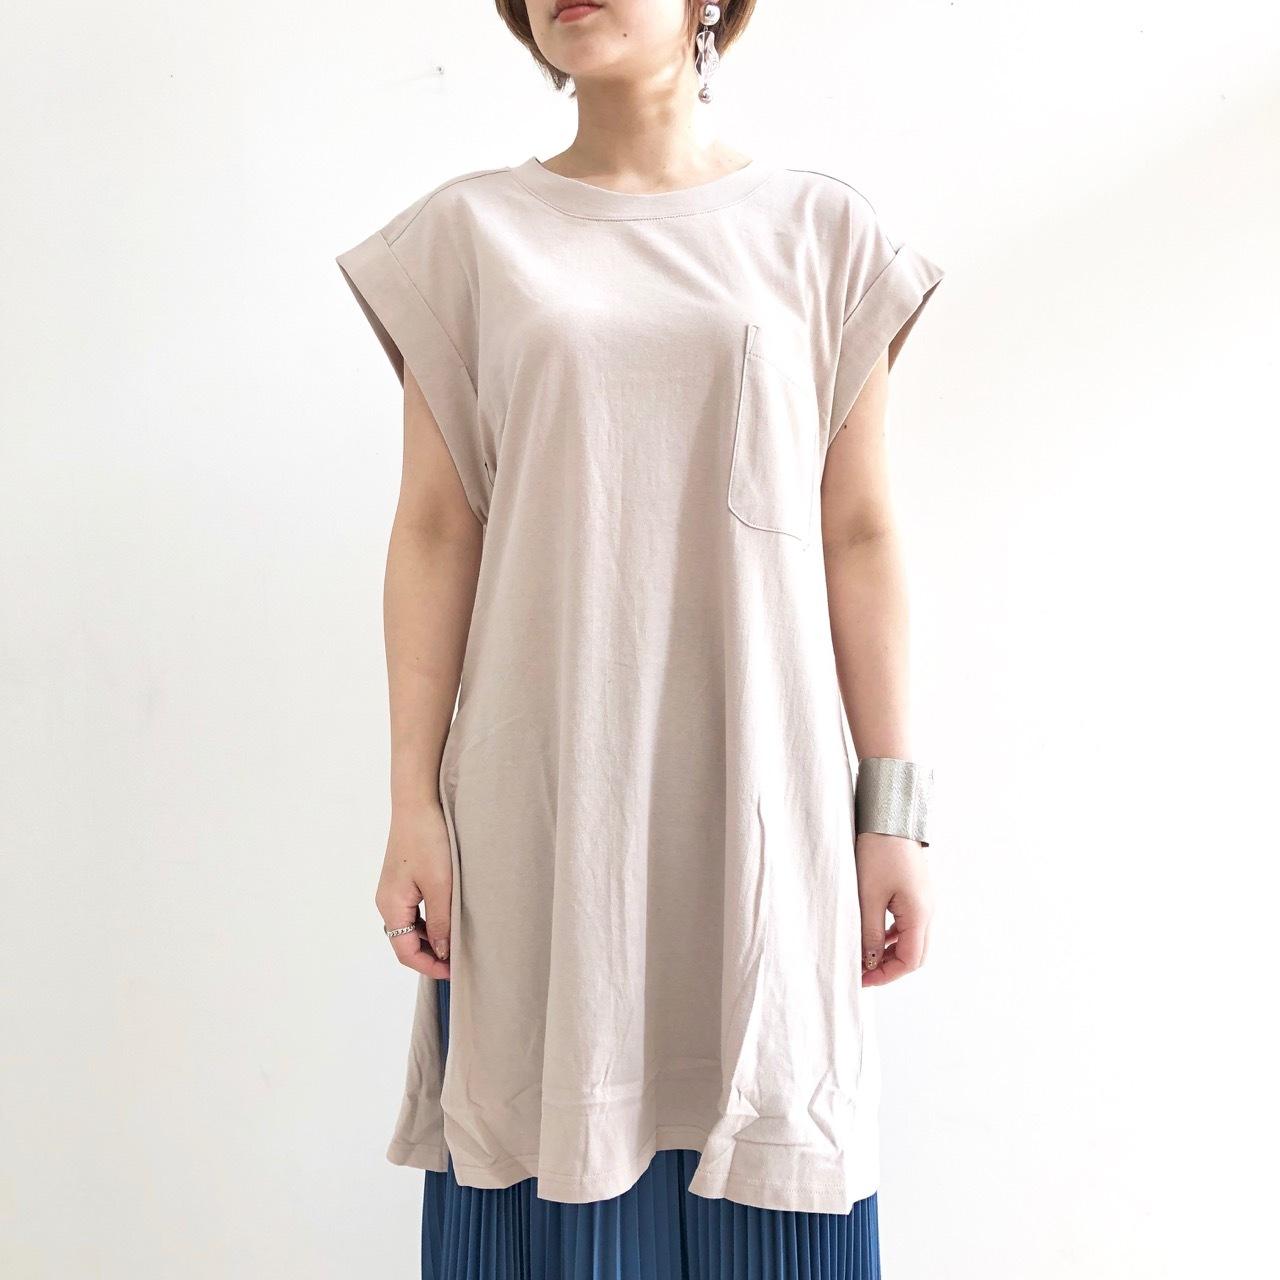 【 CHIGNONSTAR 】ポケットロングスリットTシャツ